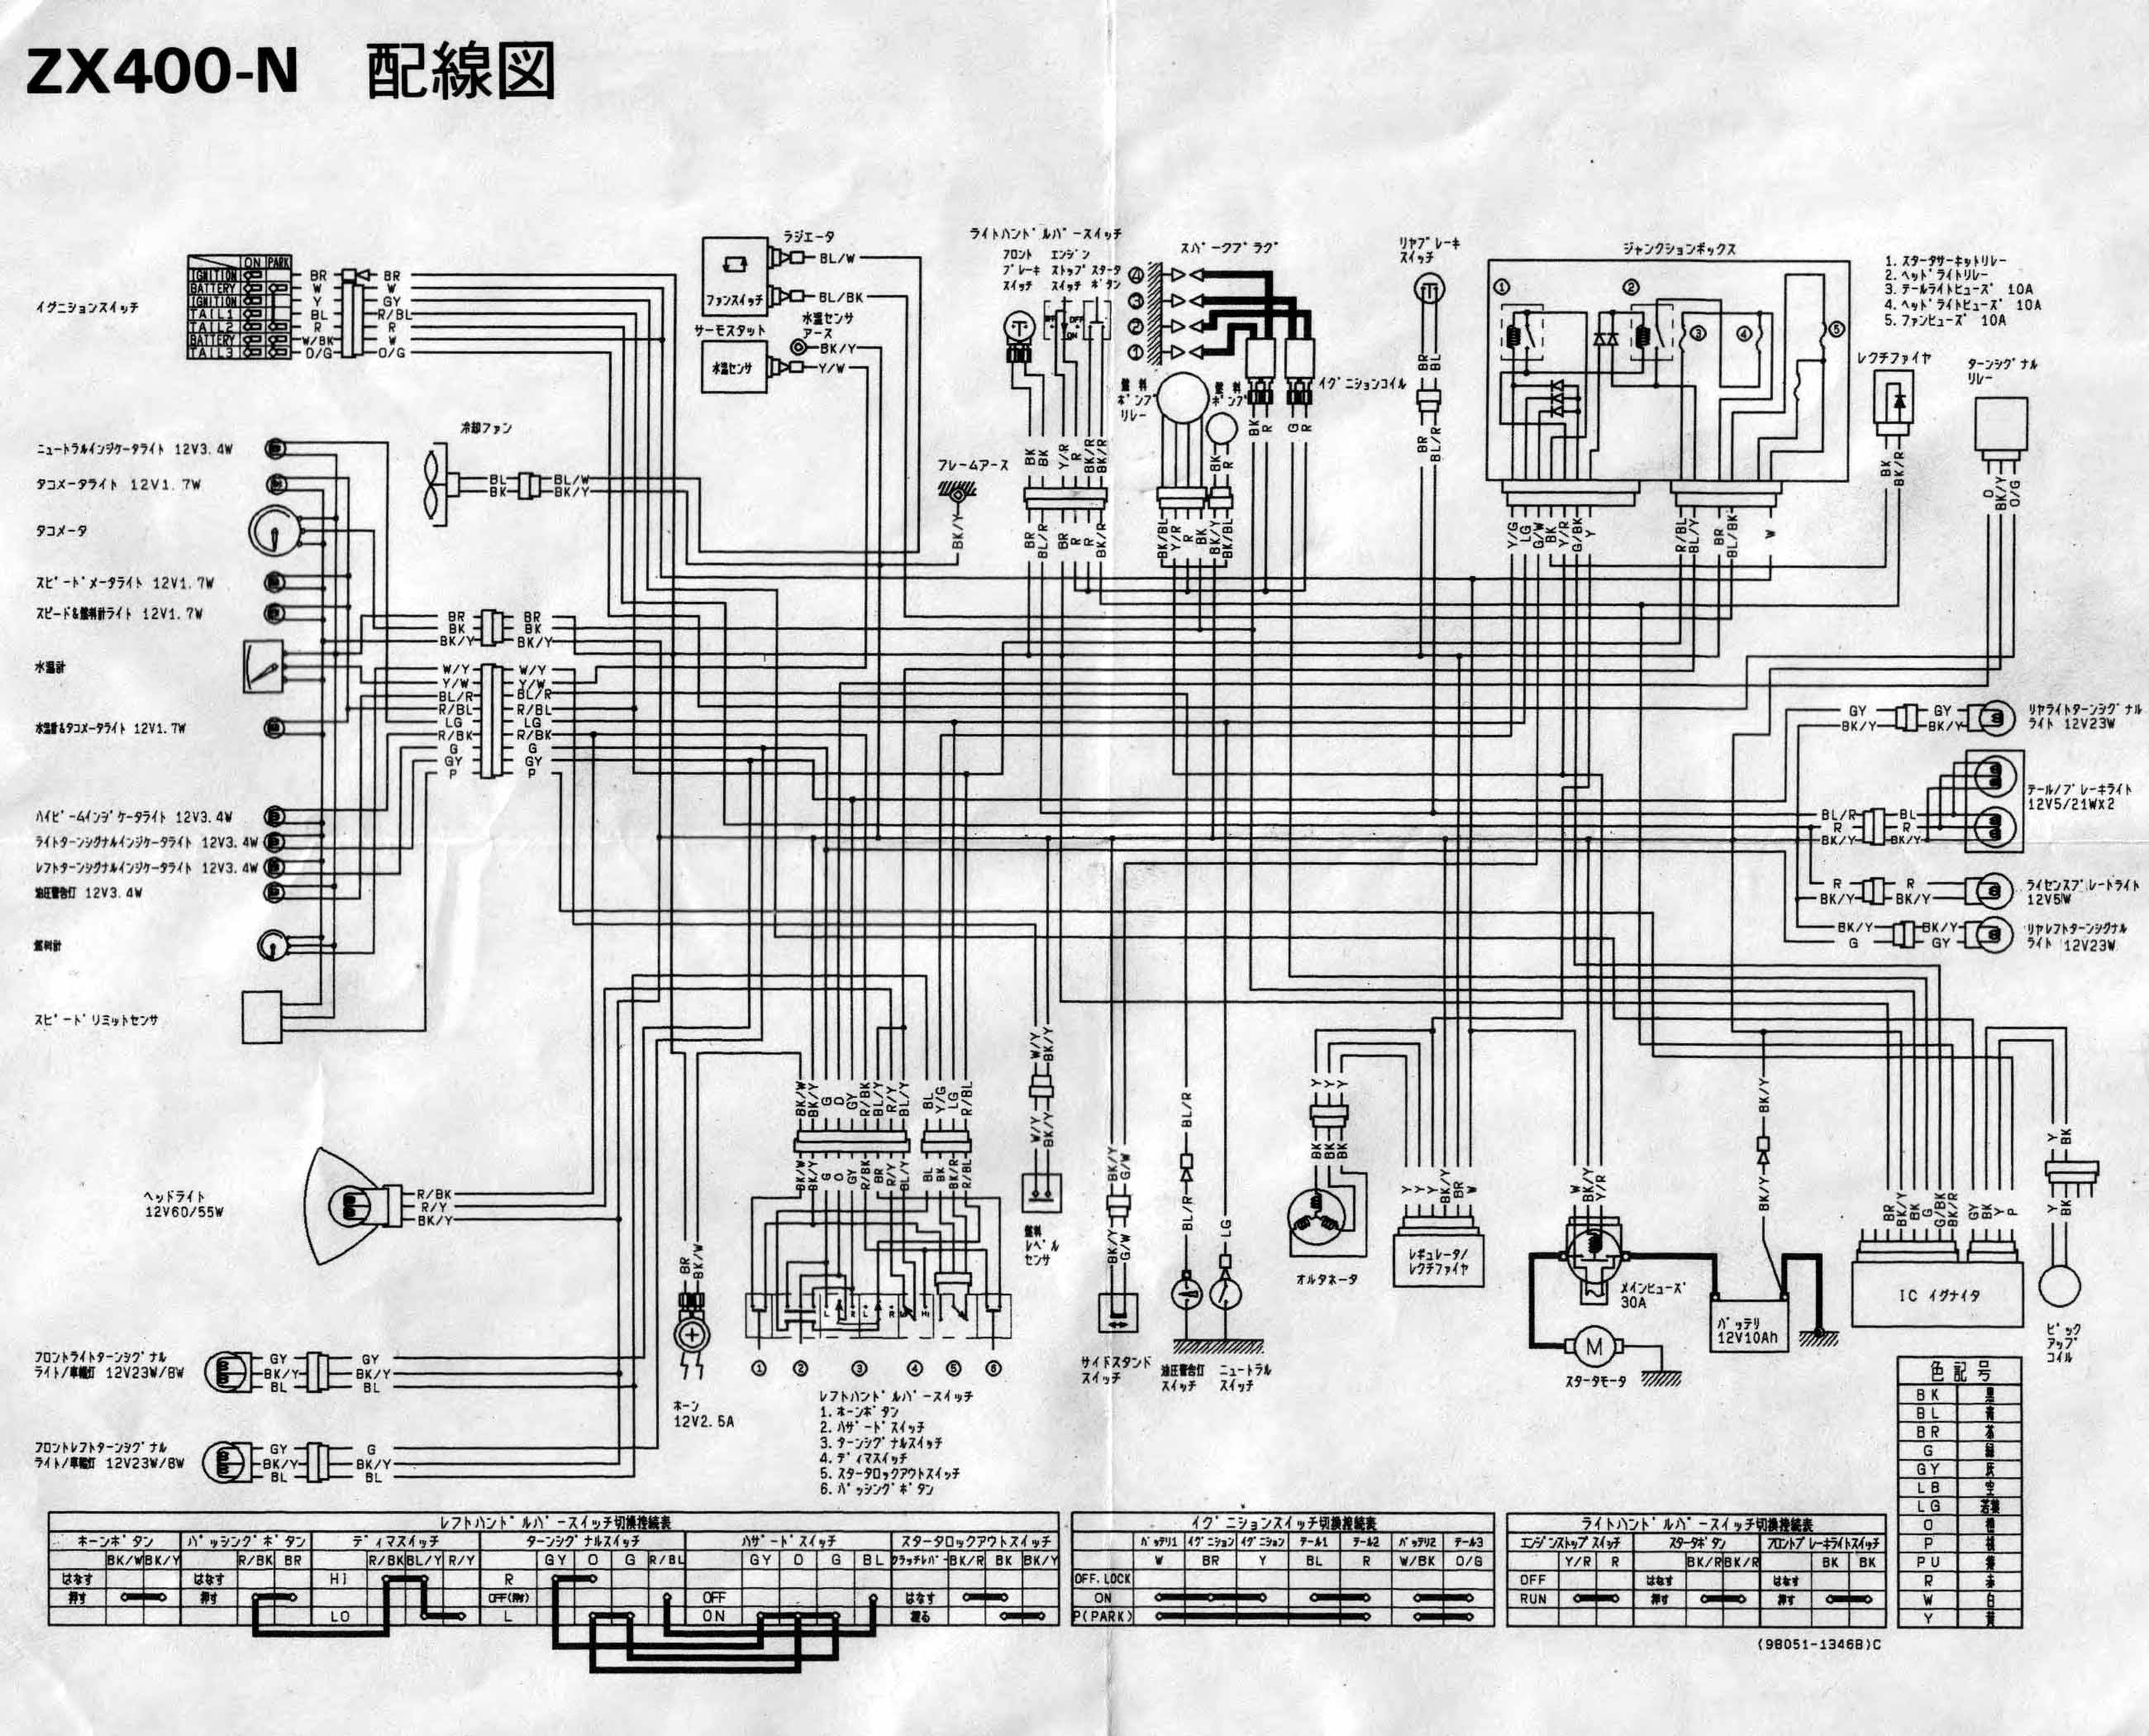 kawasaki zx7r wiring diagram 1 8t cooling diagram 2000 750 ninja rh banyan palace com Go Kart Suspension Go Kart Shocks